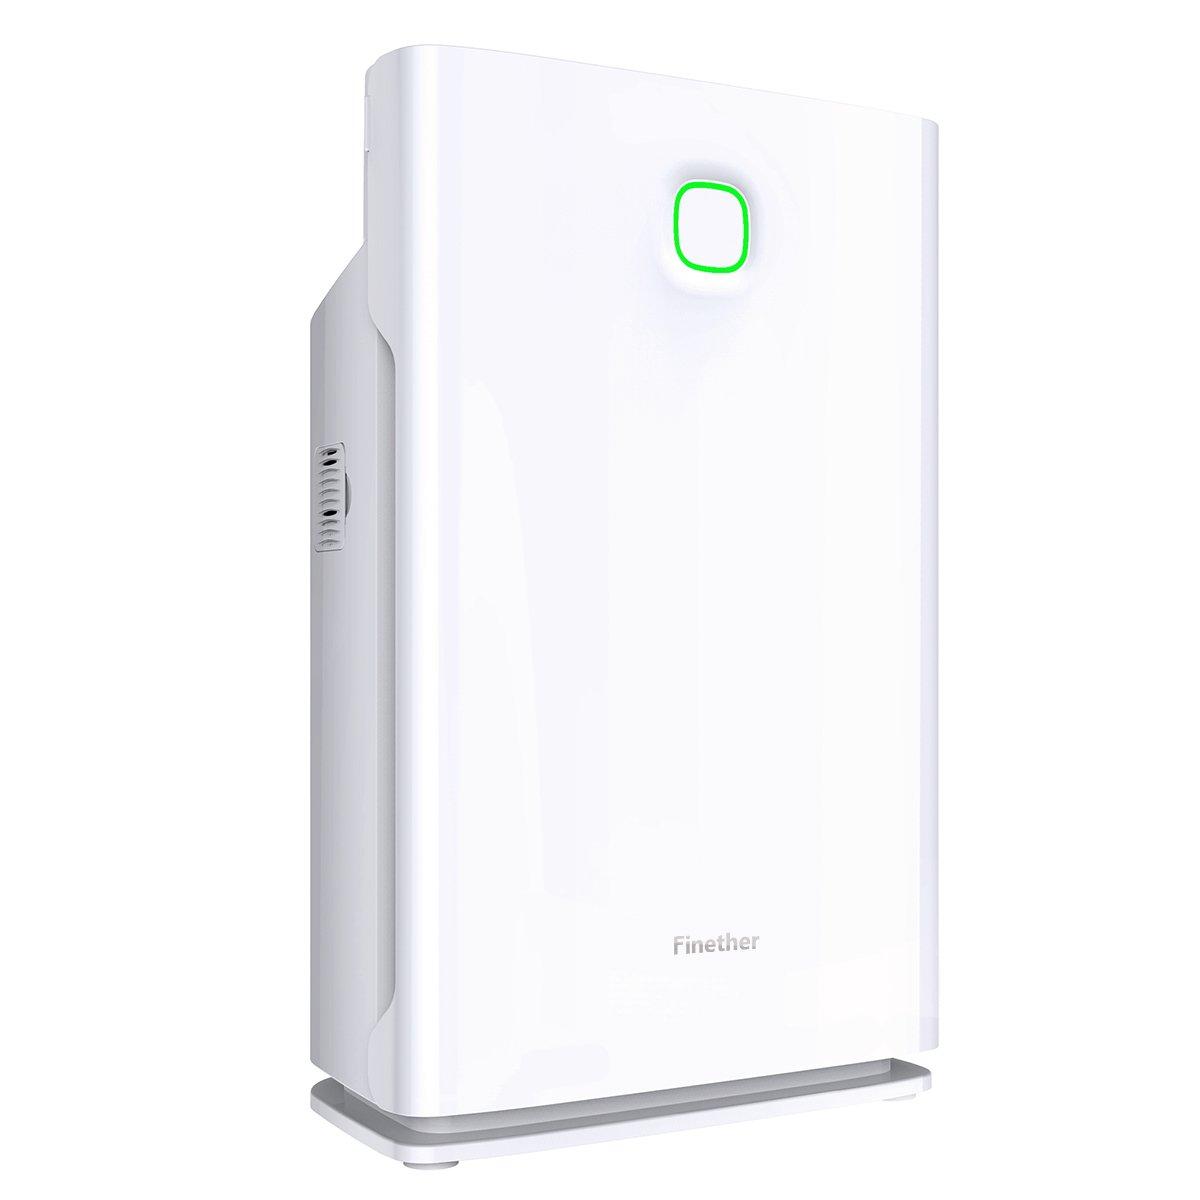 Finether - Purificador de Aire, Ionizador de Aire, hasta 45m², 340 m³/